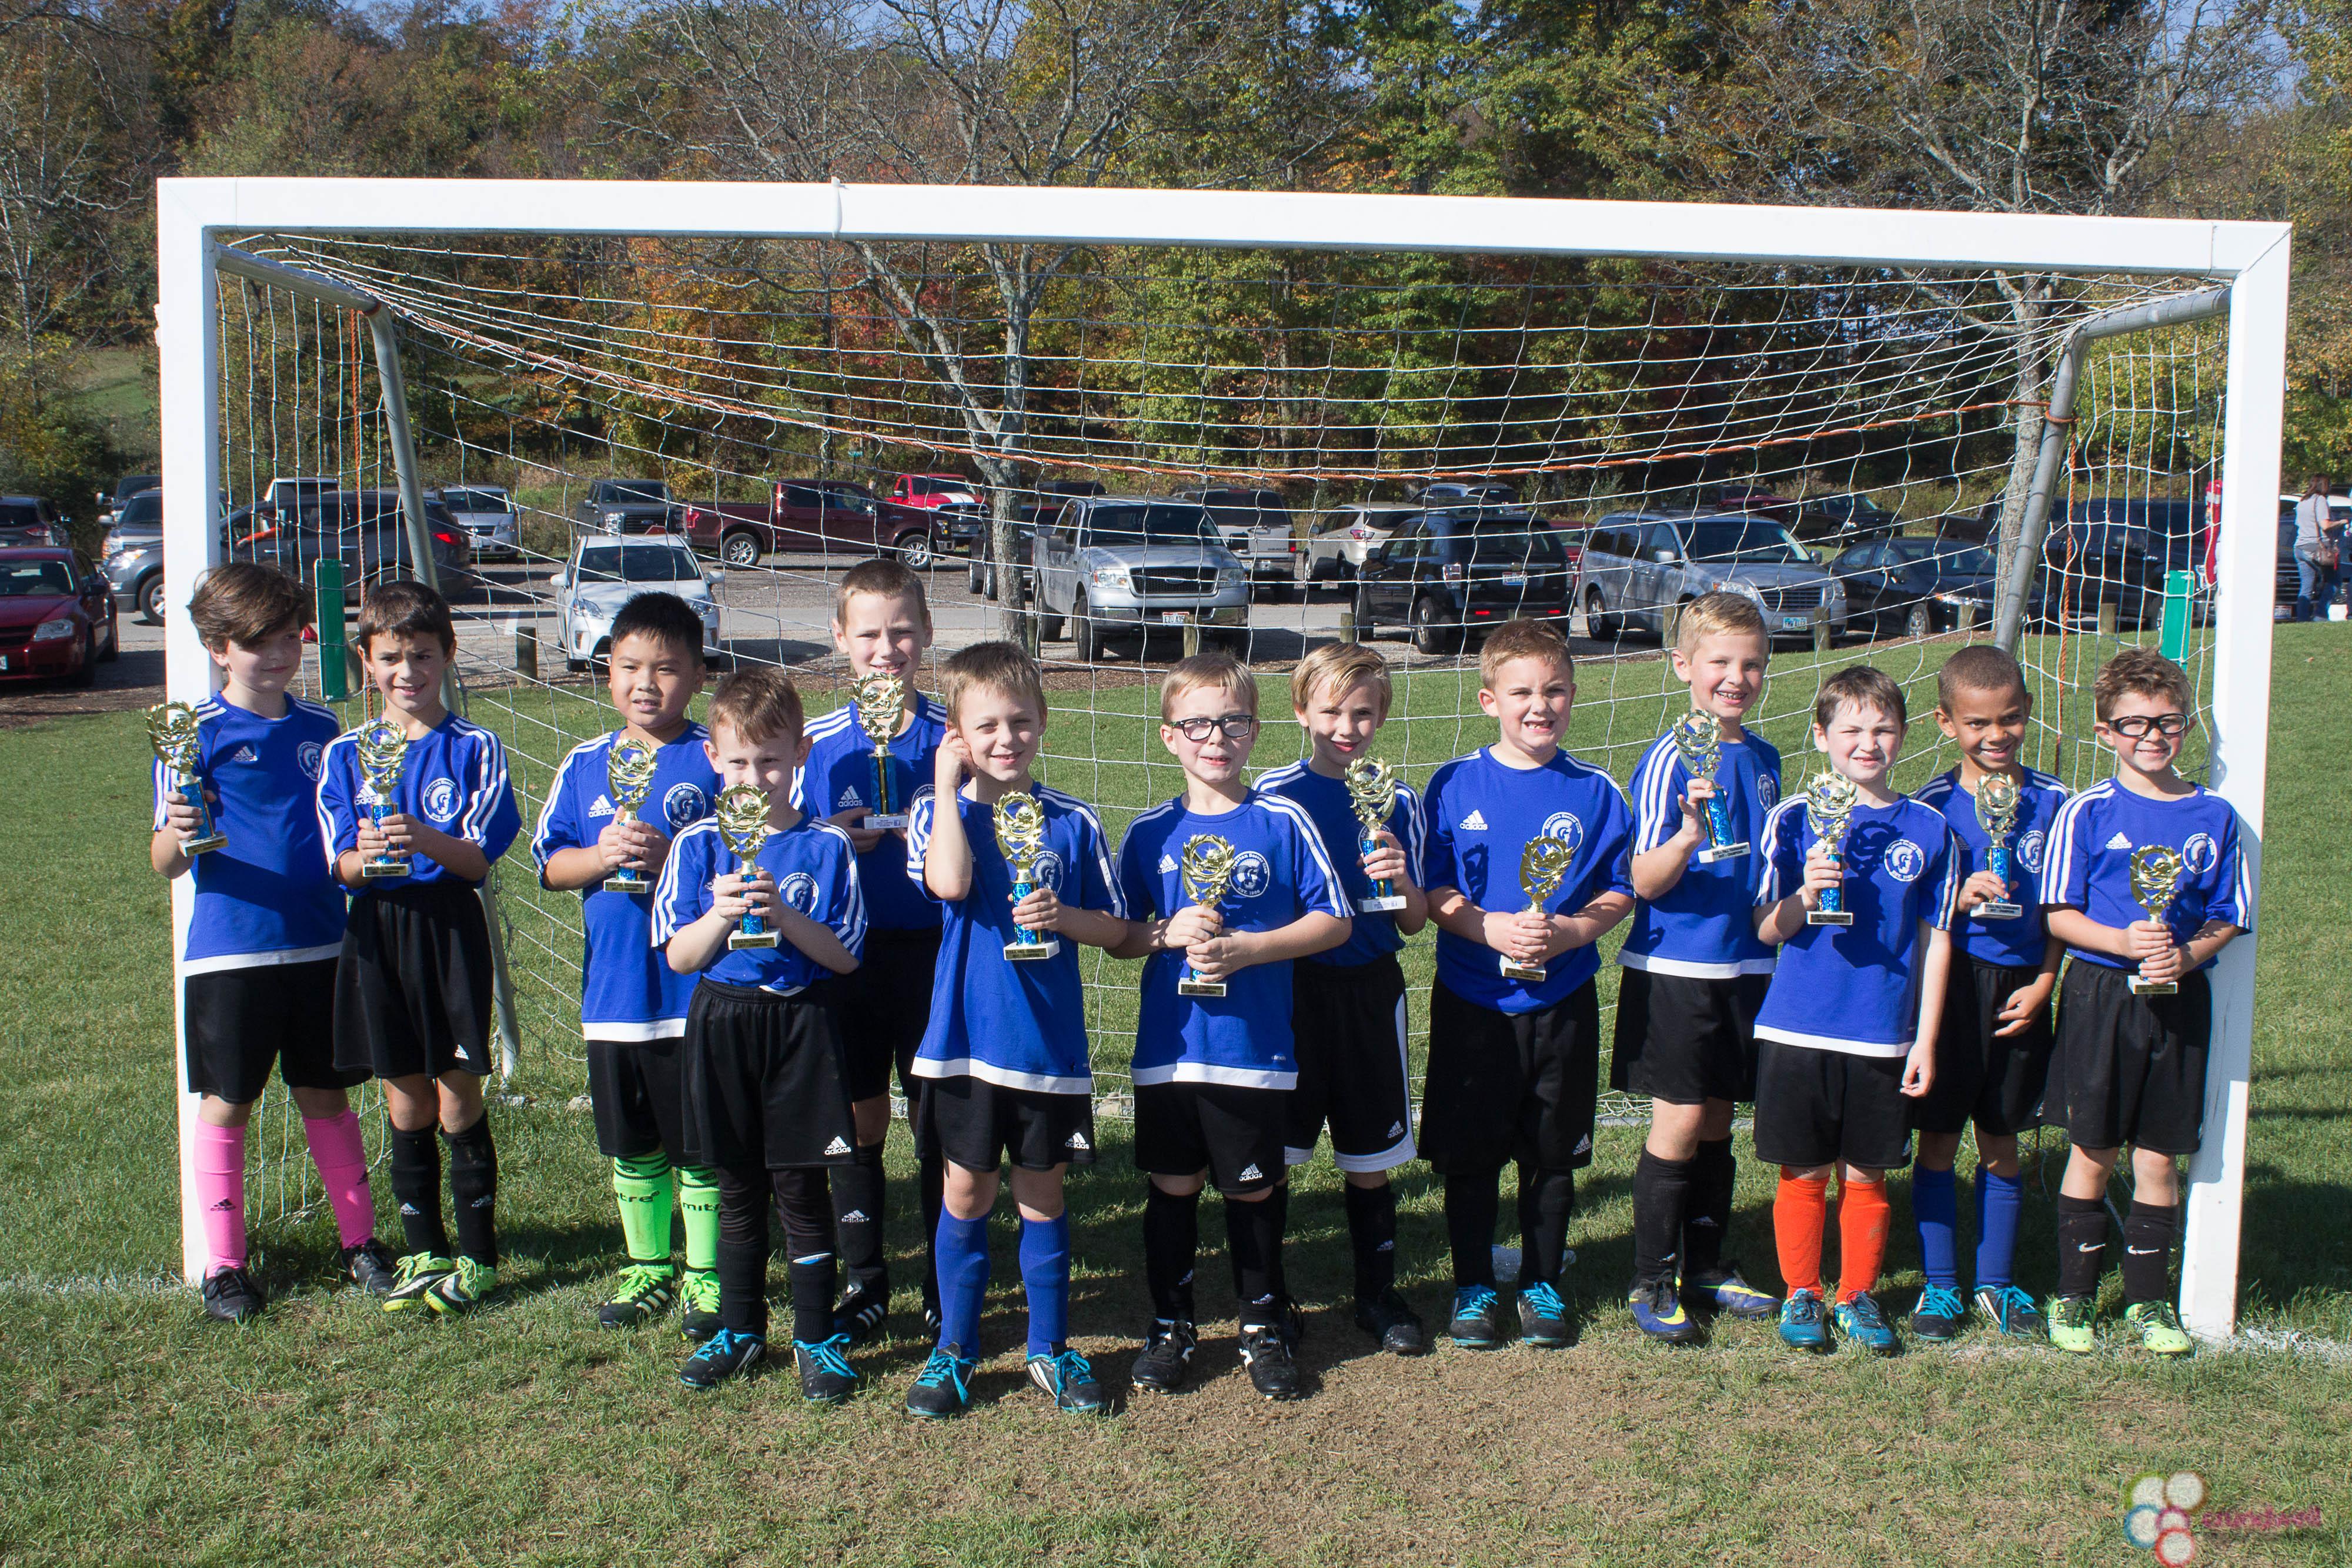 2017-10-14-Spartan-U9-Soccer-Final (126 of 134)